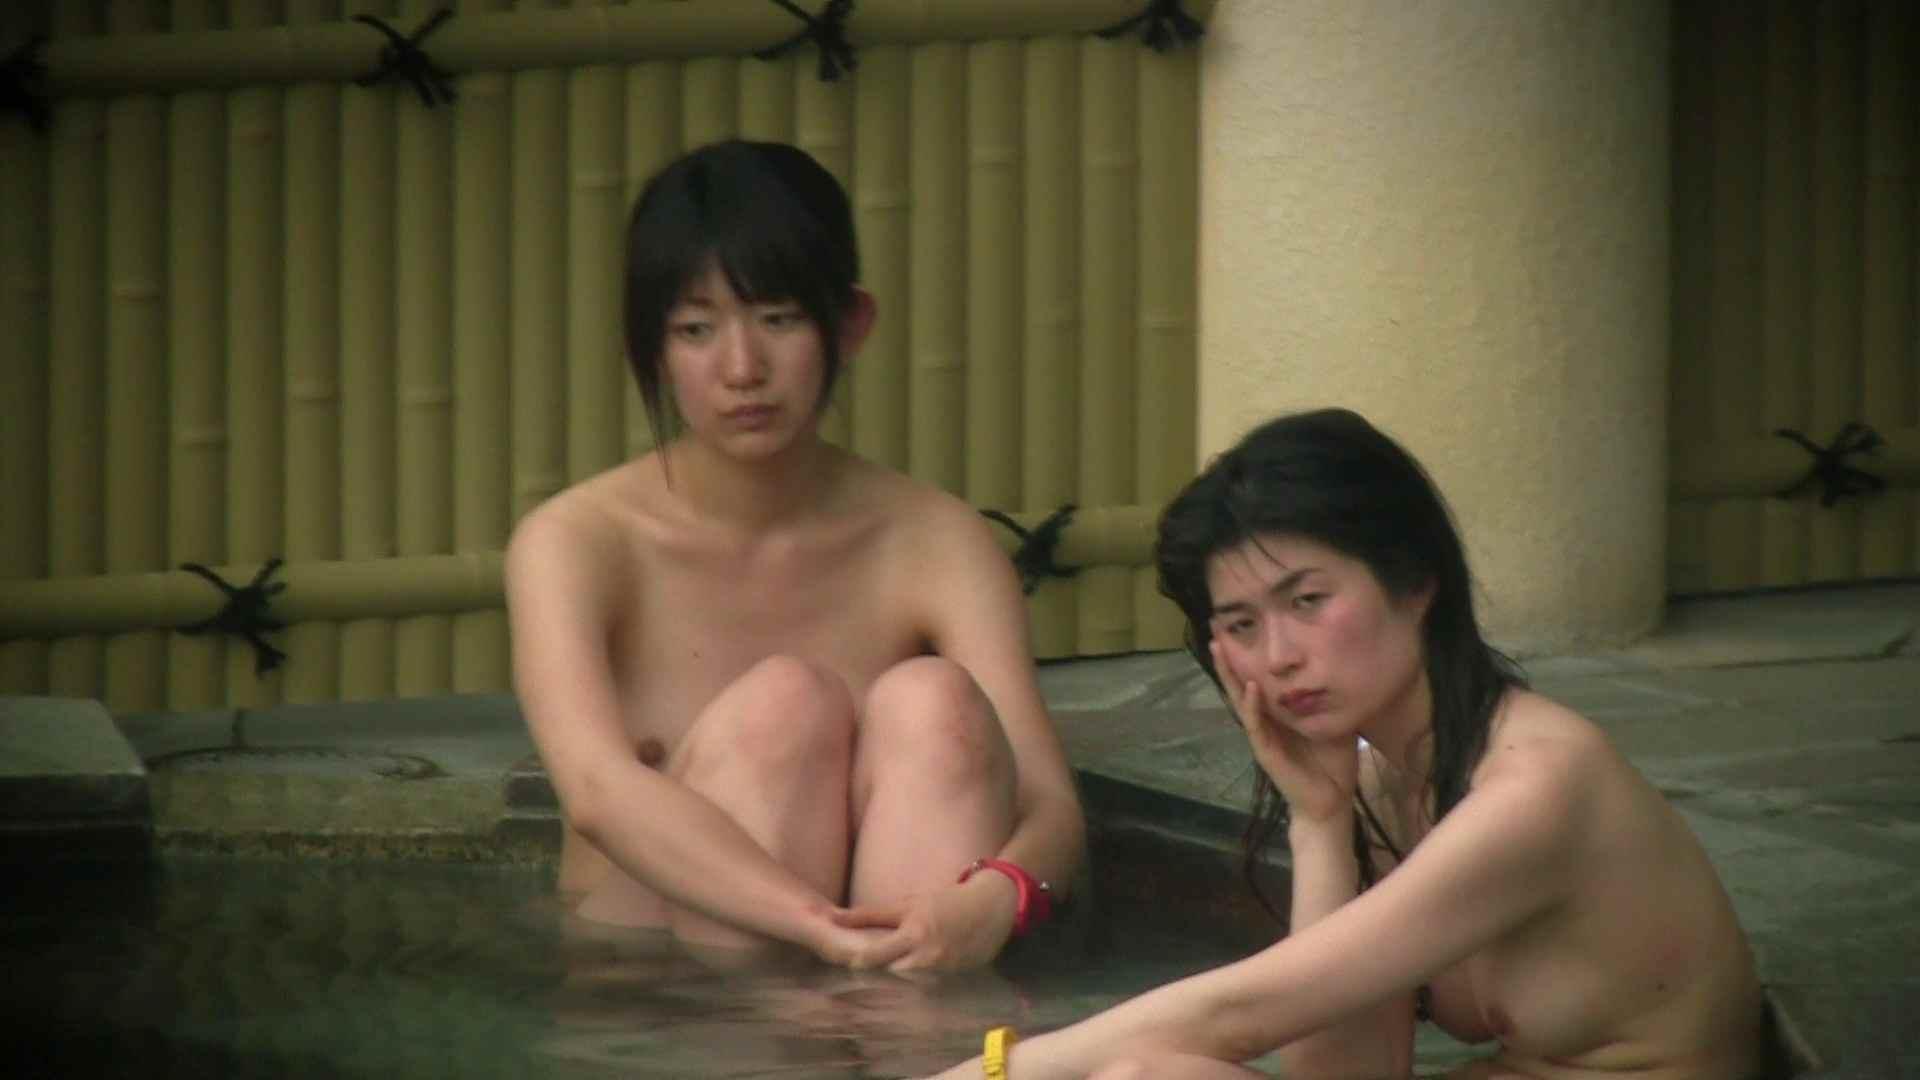 Aquaな露天風呂Vol.144 盗撮師作品 おめこ無修正動画無料 94pic 77